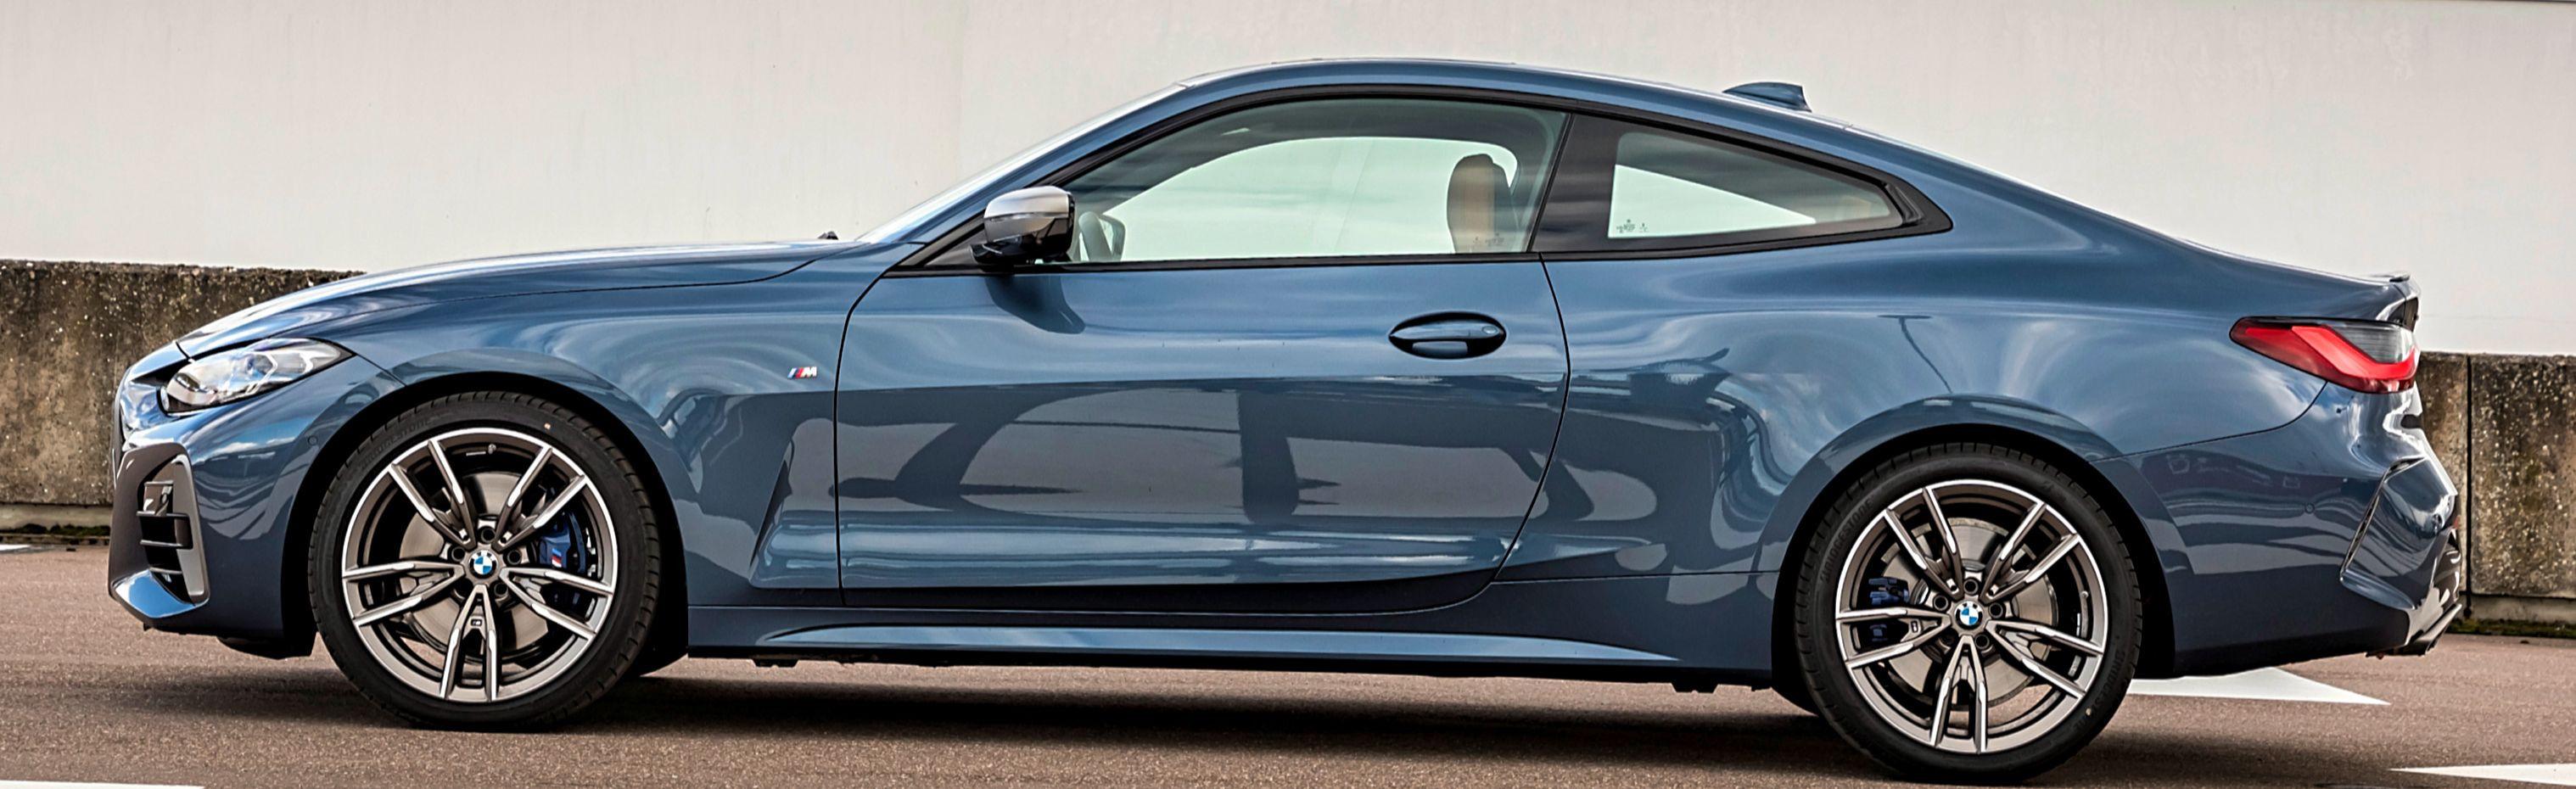 La BMW Série 4